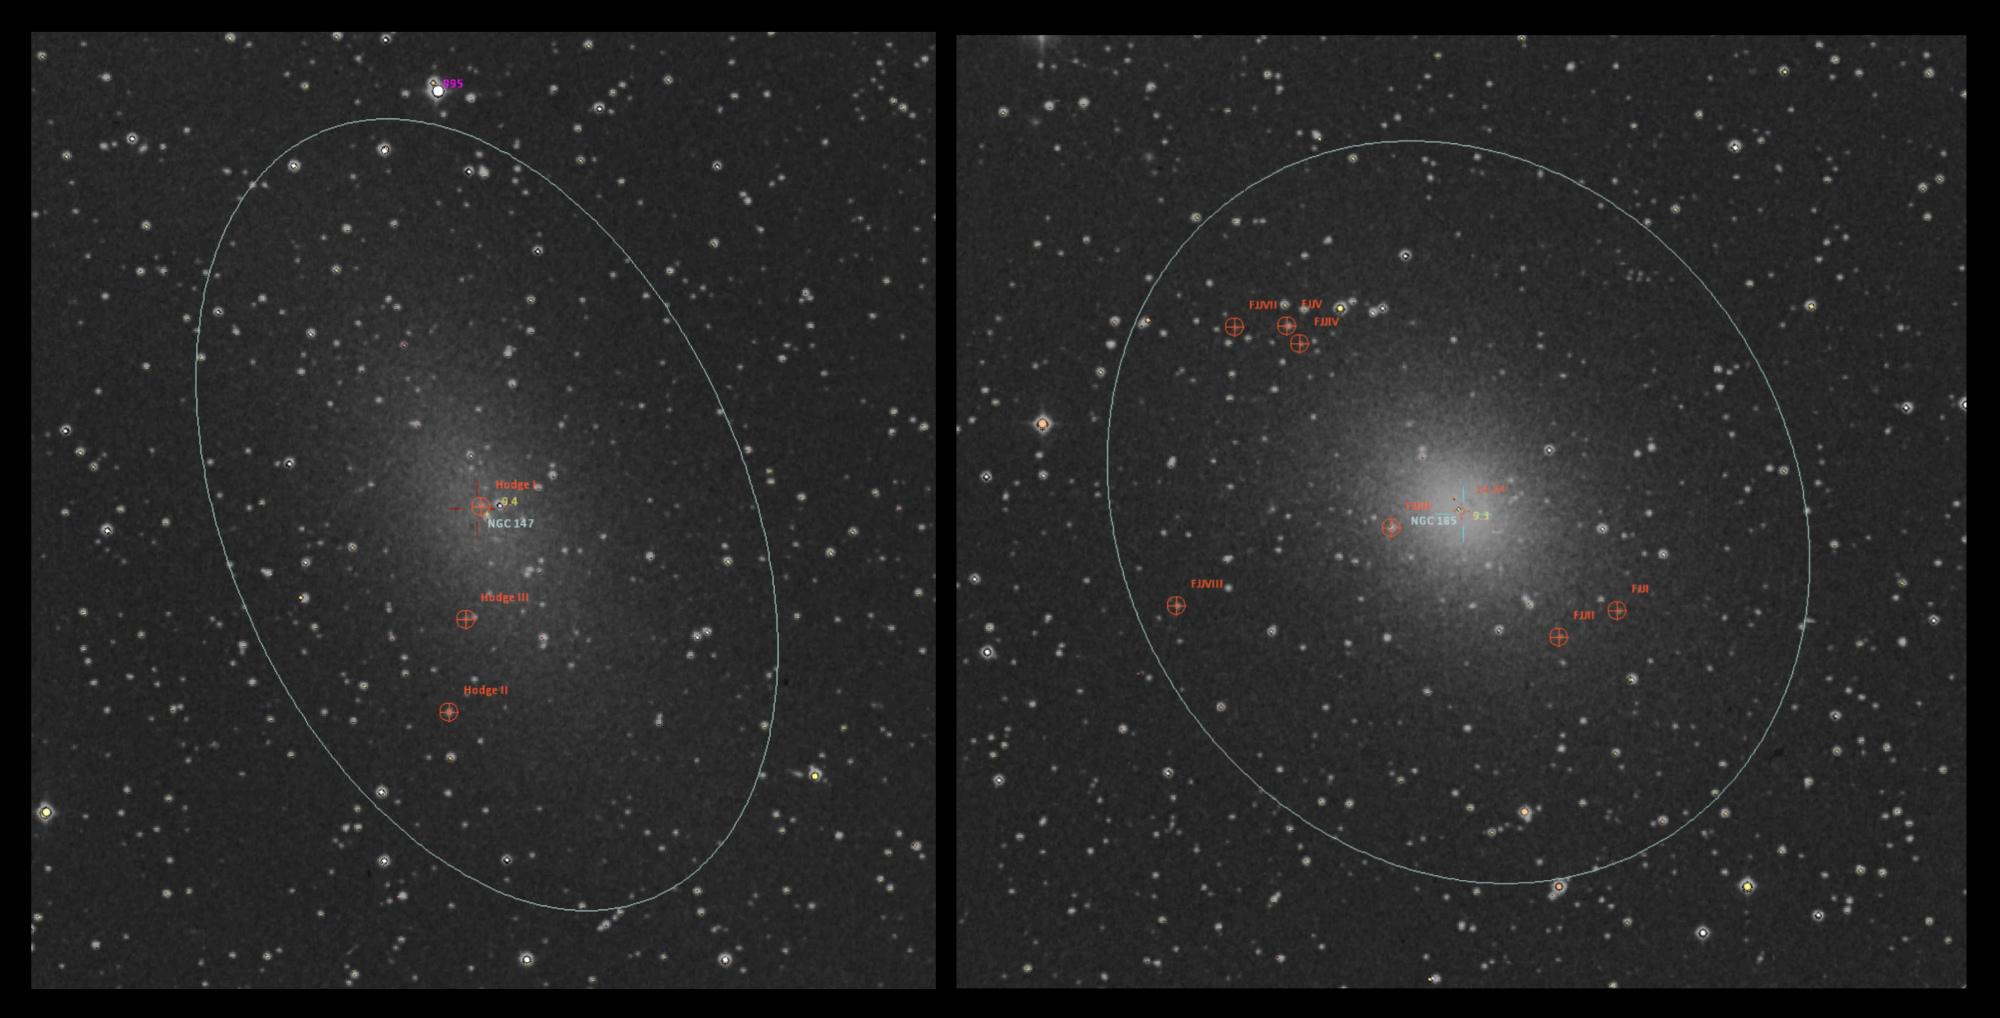 NGC 147 & 185 GCs Guide8.jpg